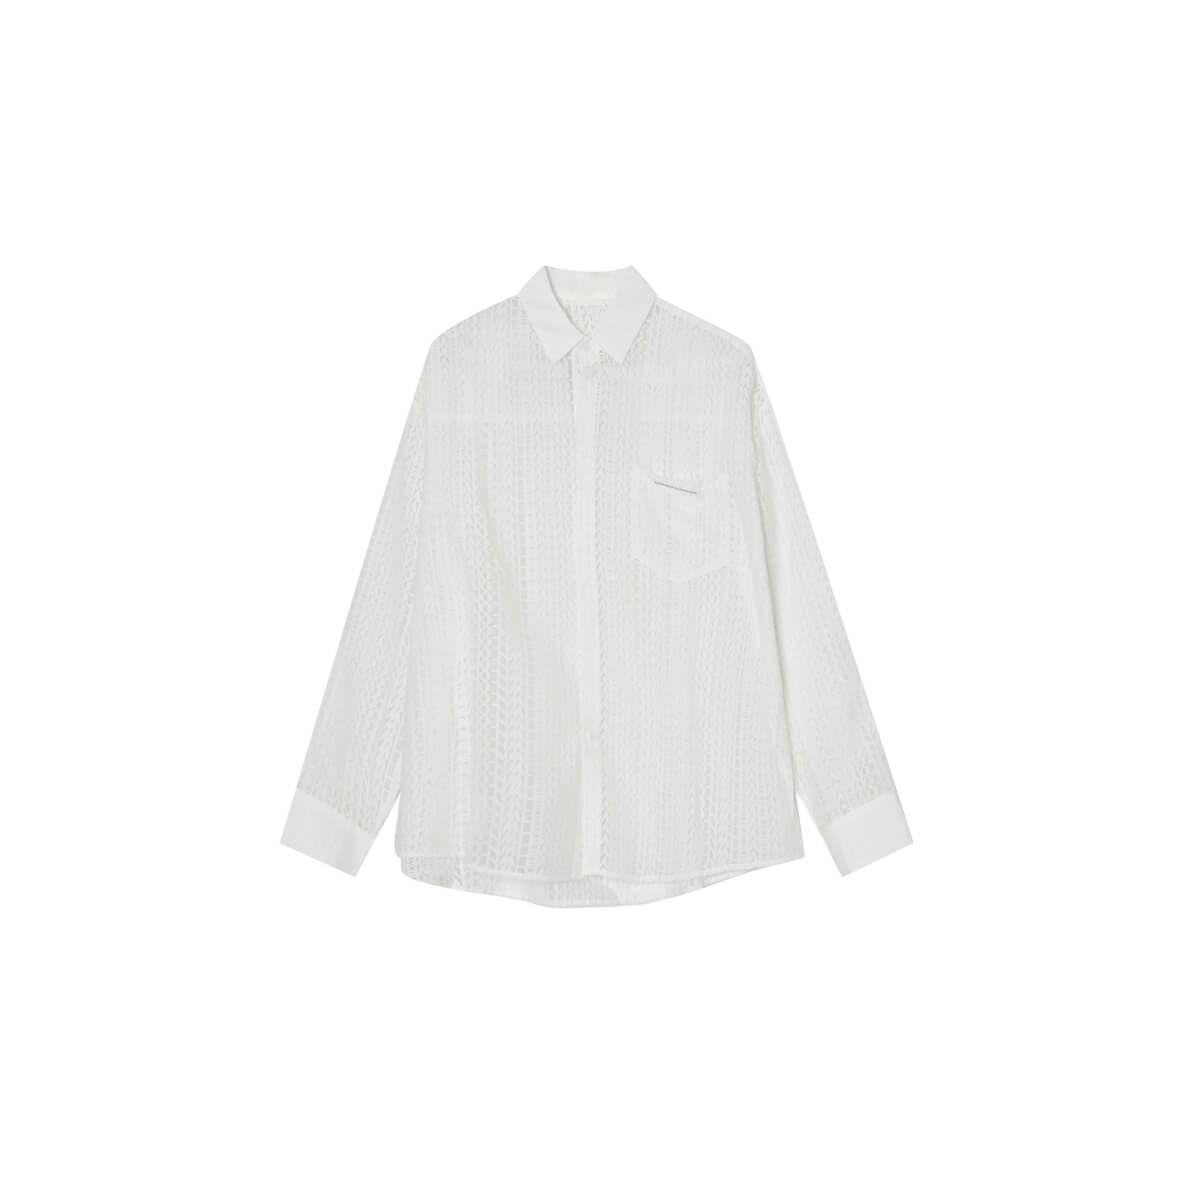 Рубашка Cui Layout Studio x Hyeinseo Shirt Lettering Texture White